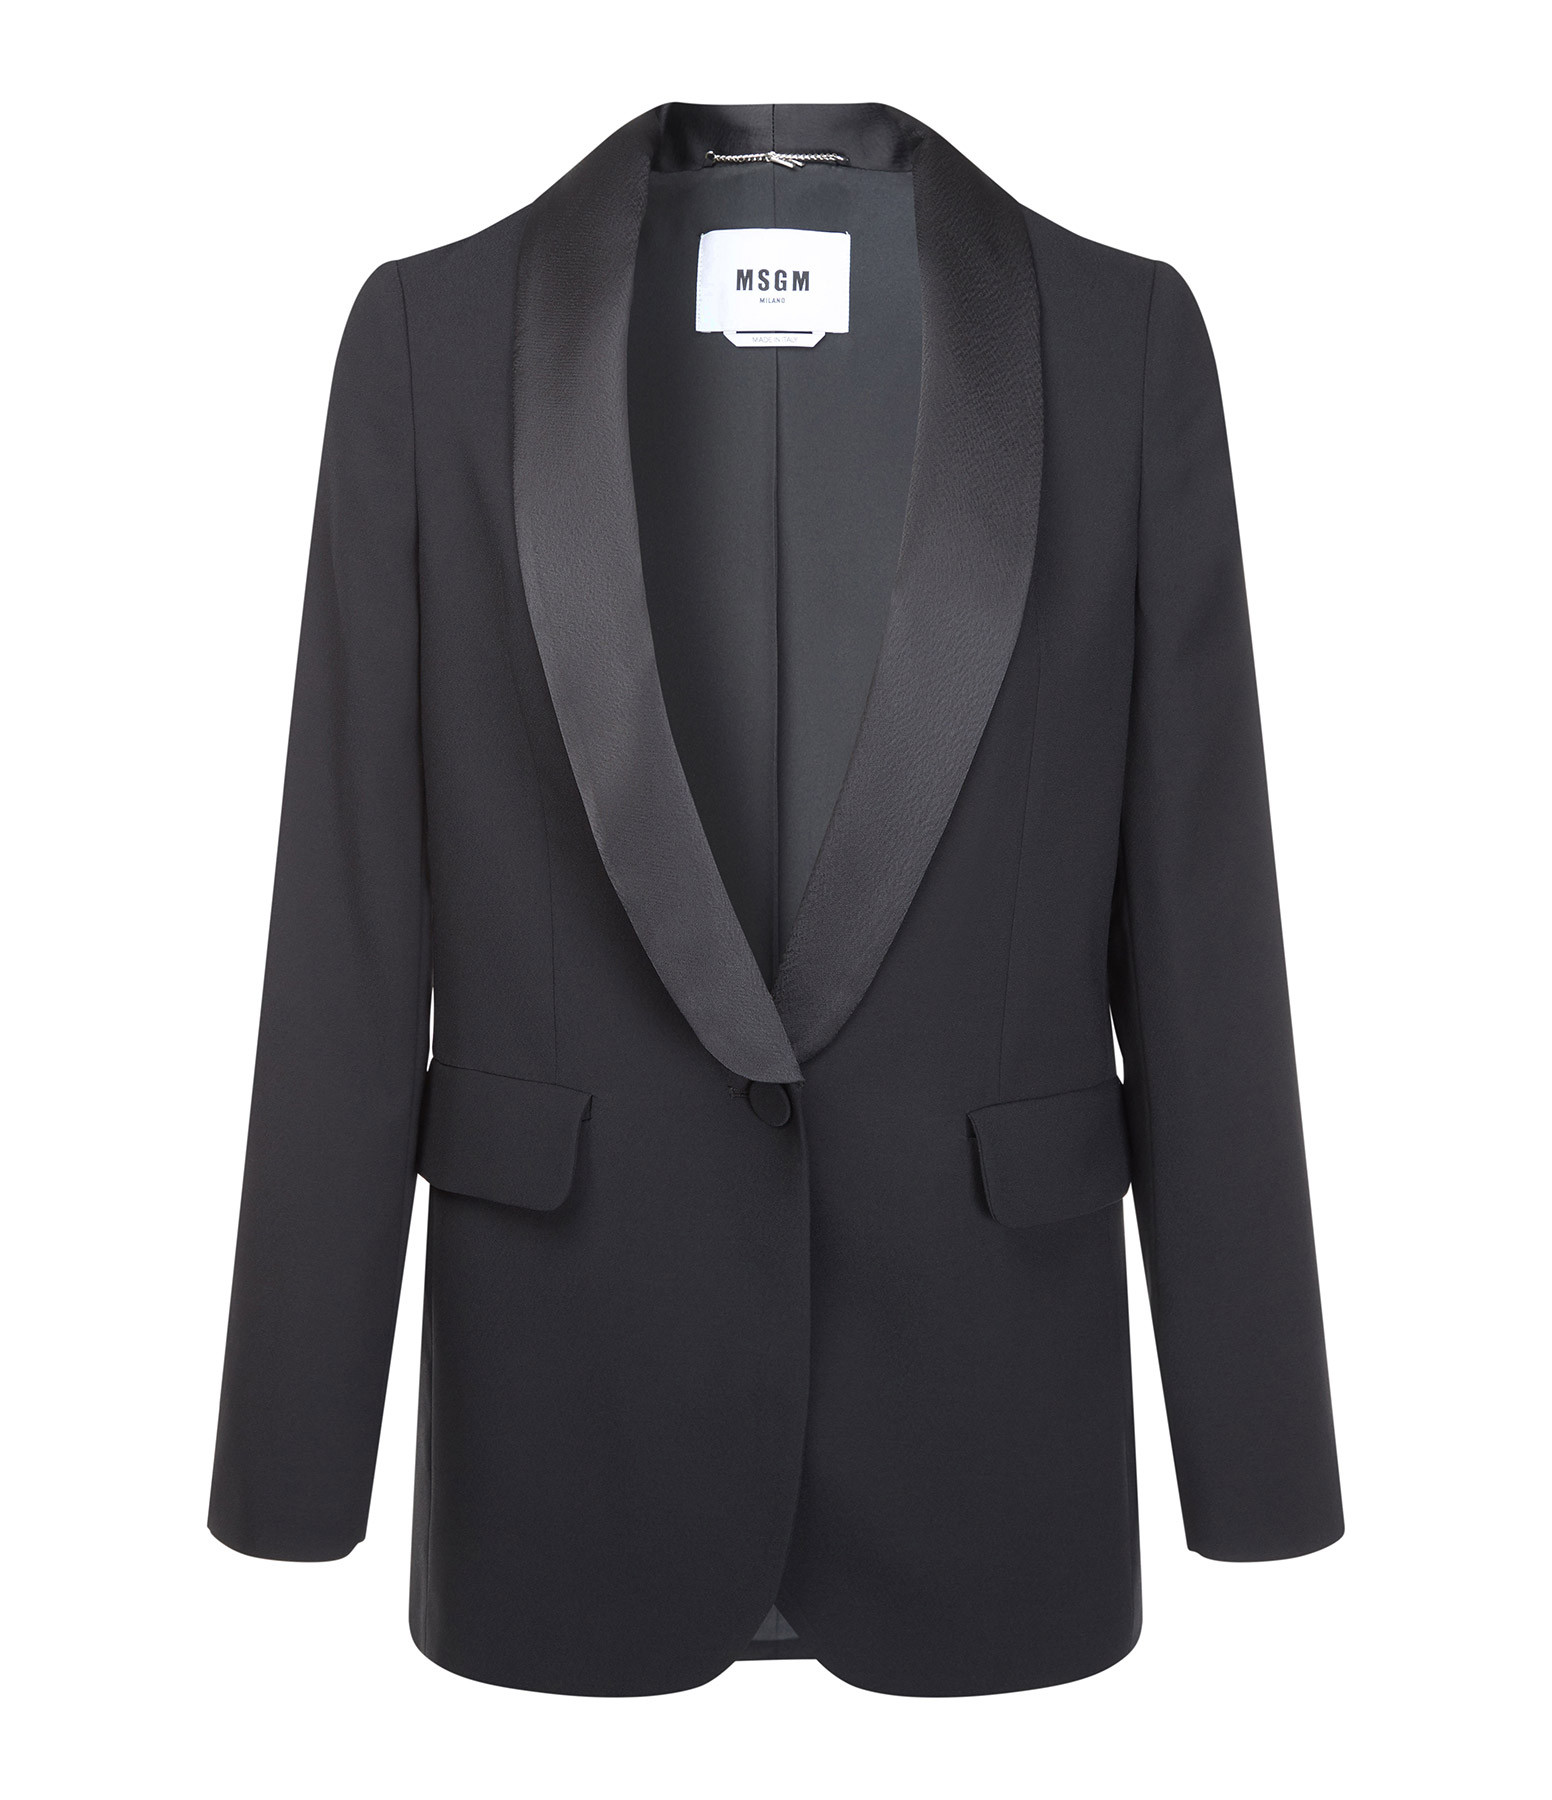 MSGM - Veste Blazer Noir